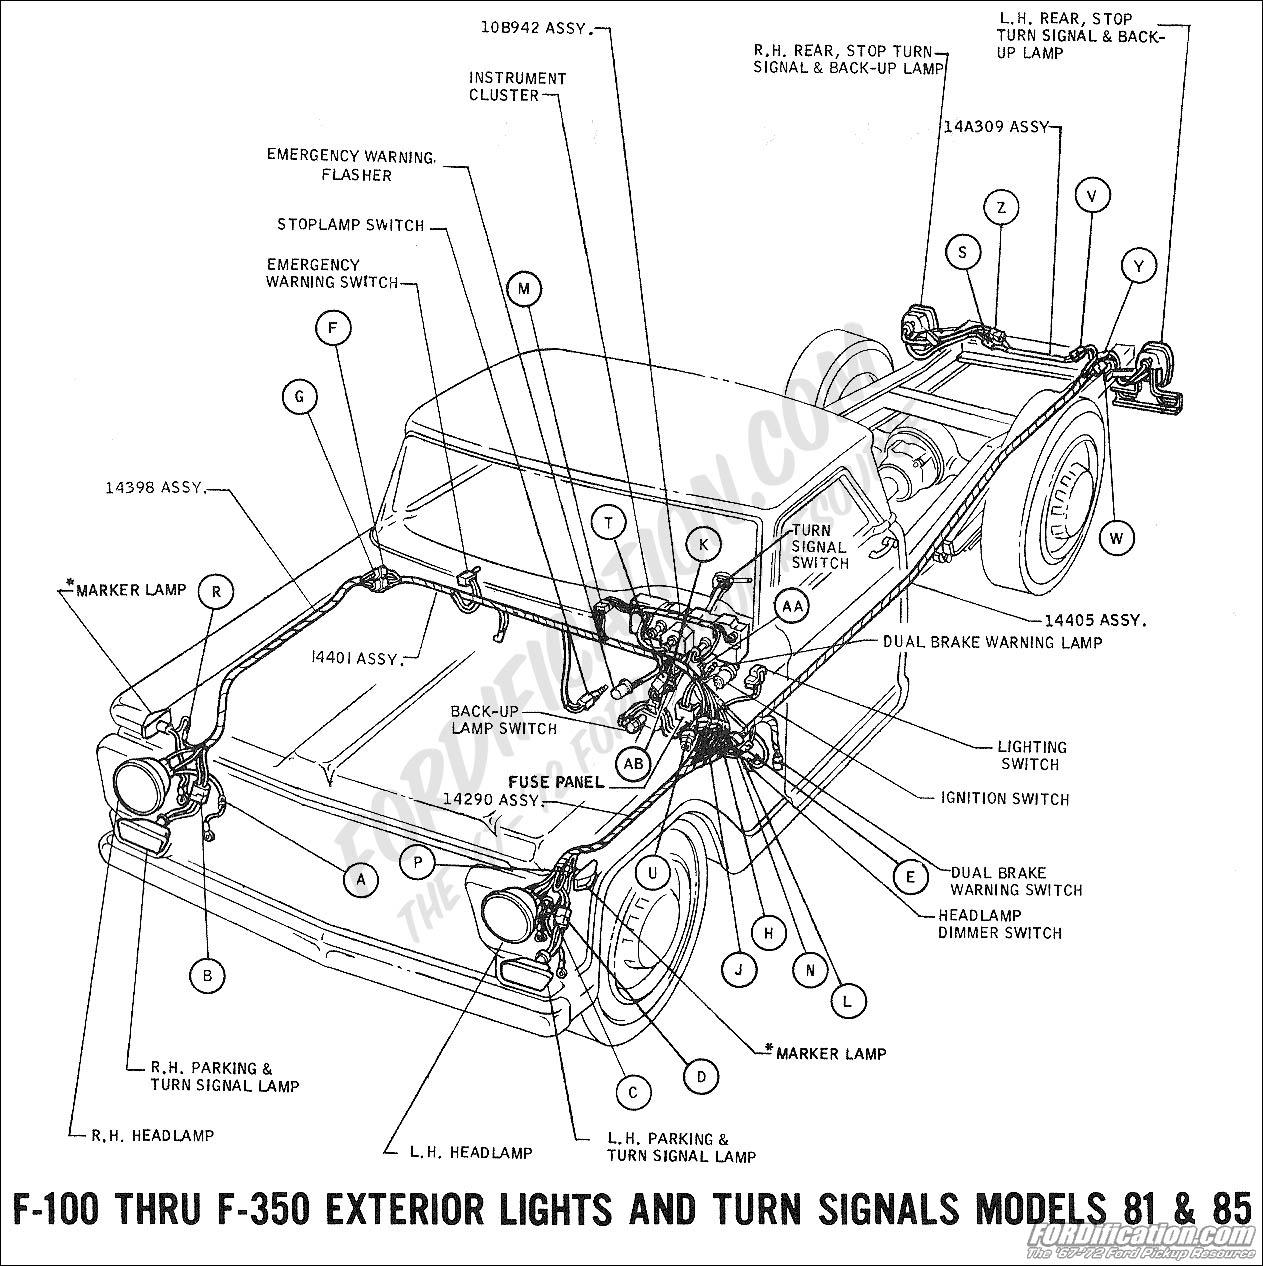 1969 f 100 thru f 350 exterior lights and turn signals